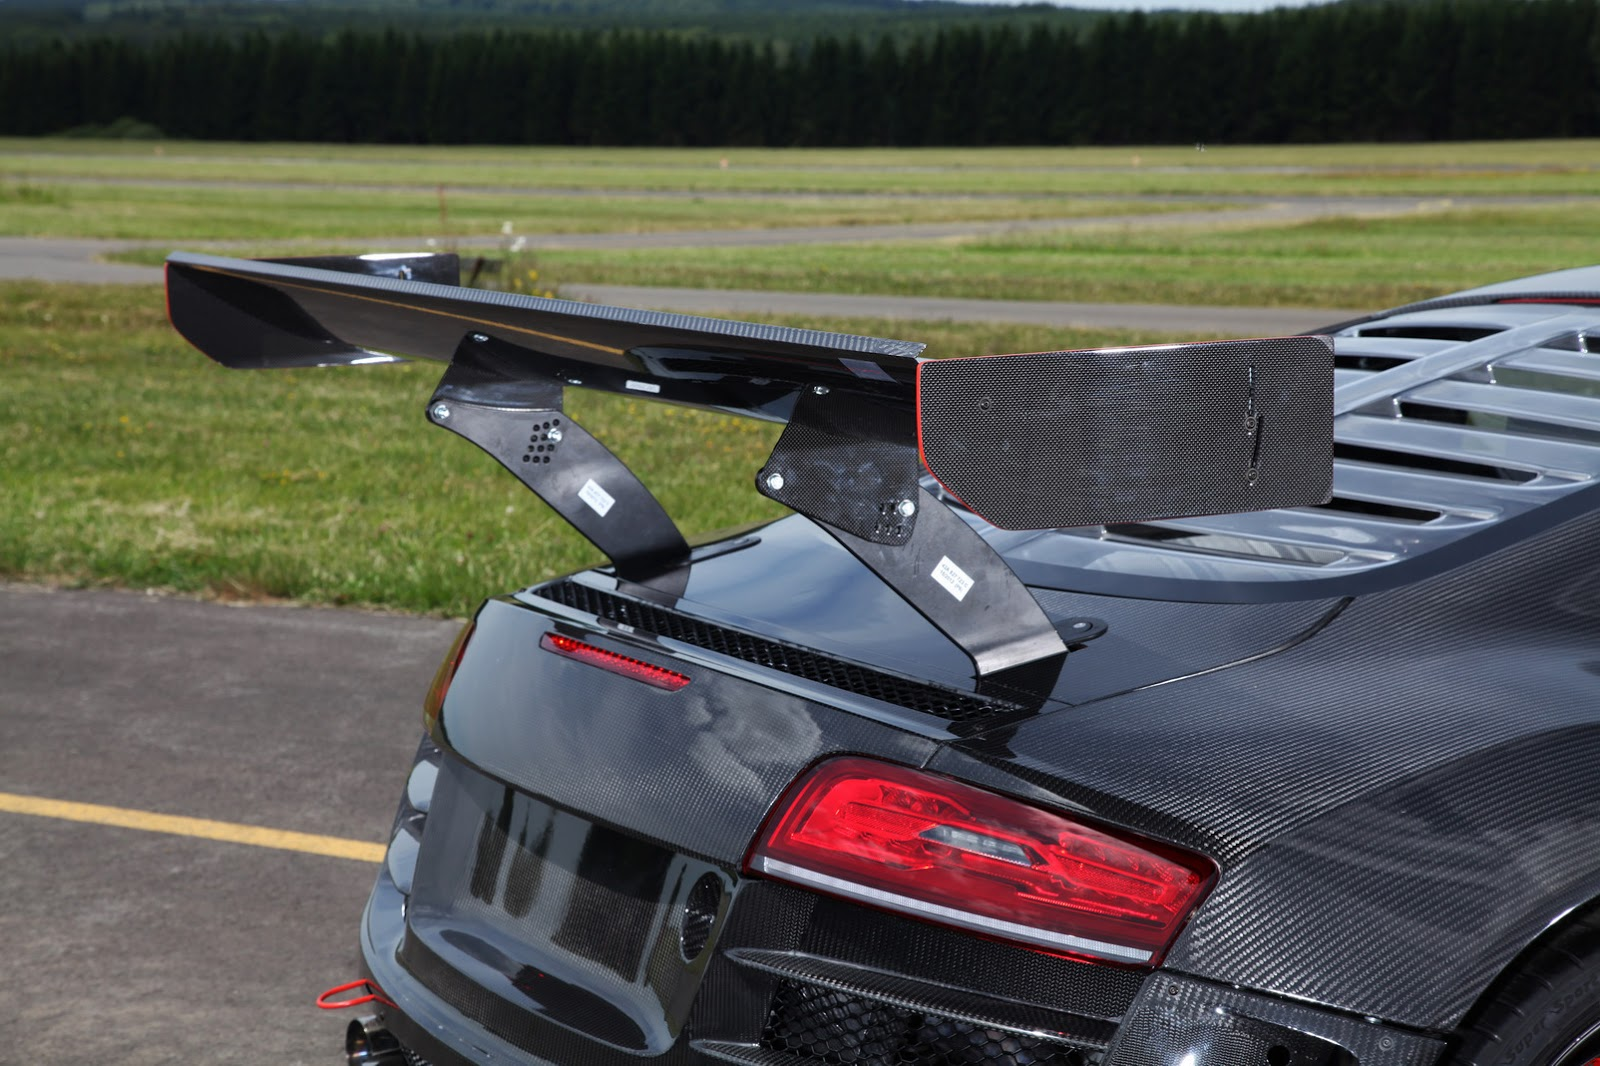 Audi-R8-Recon-MR8-8.jpg